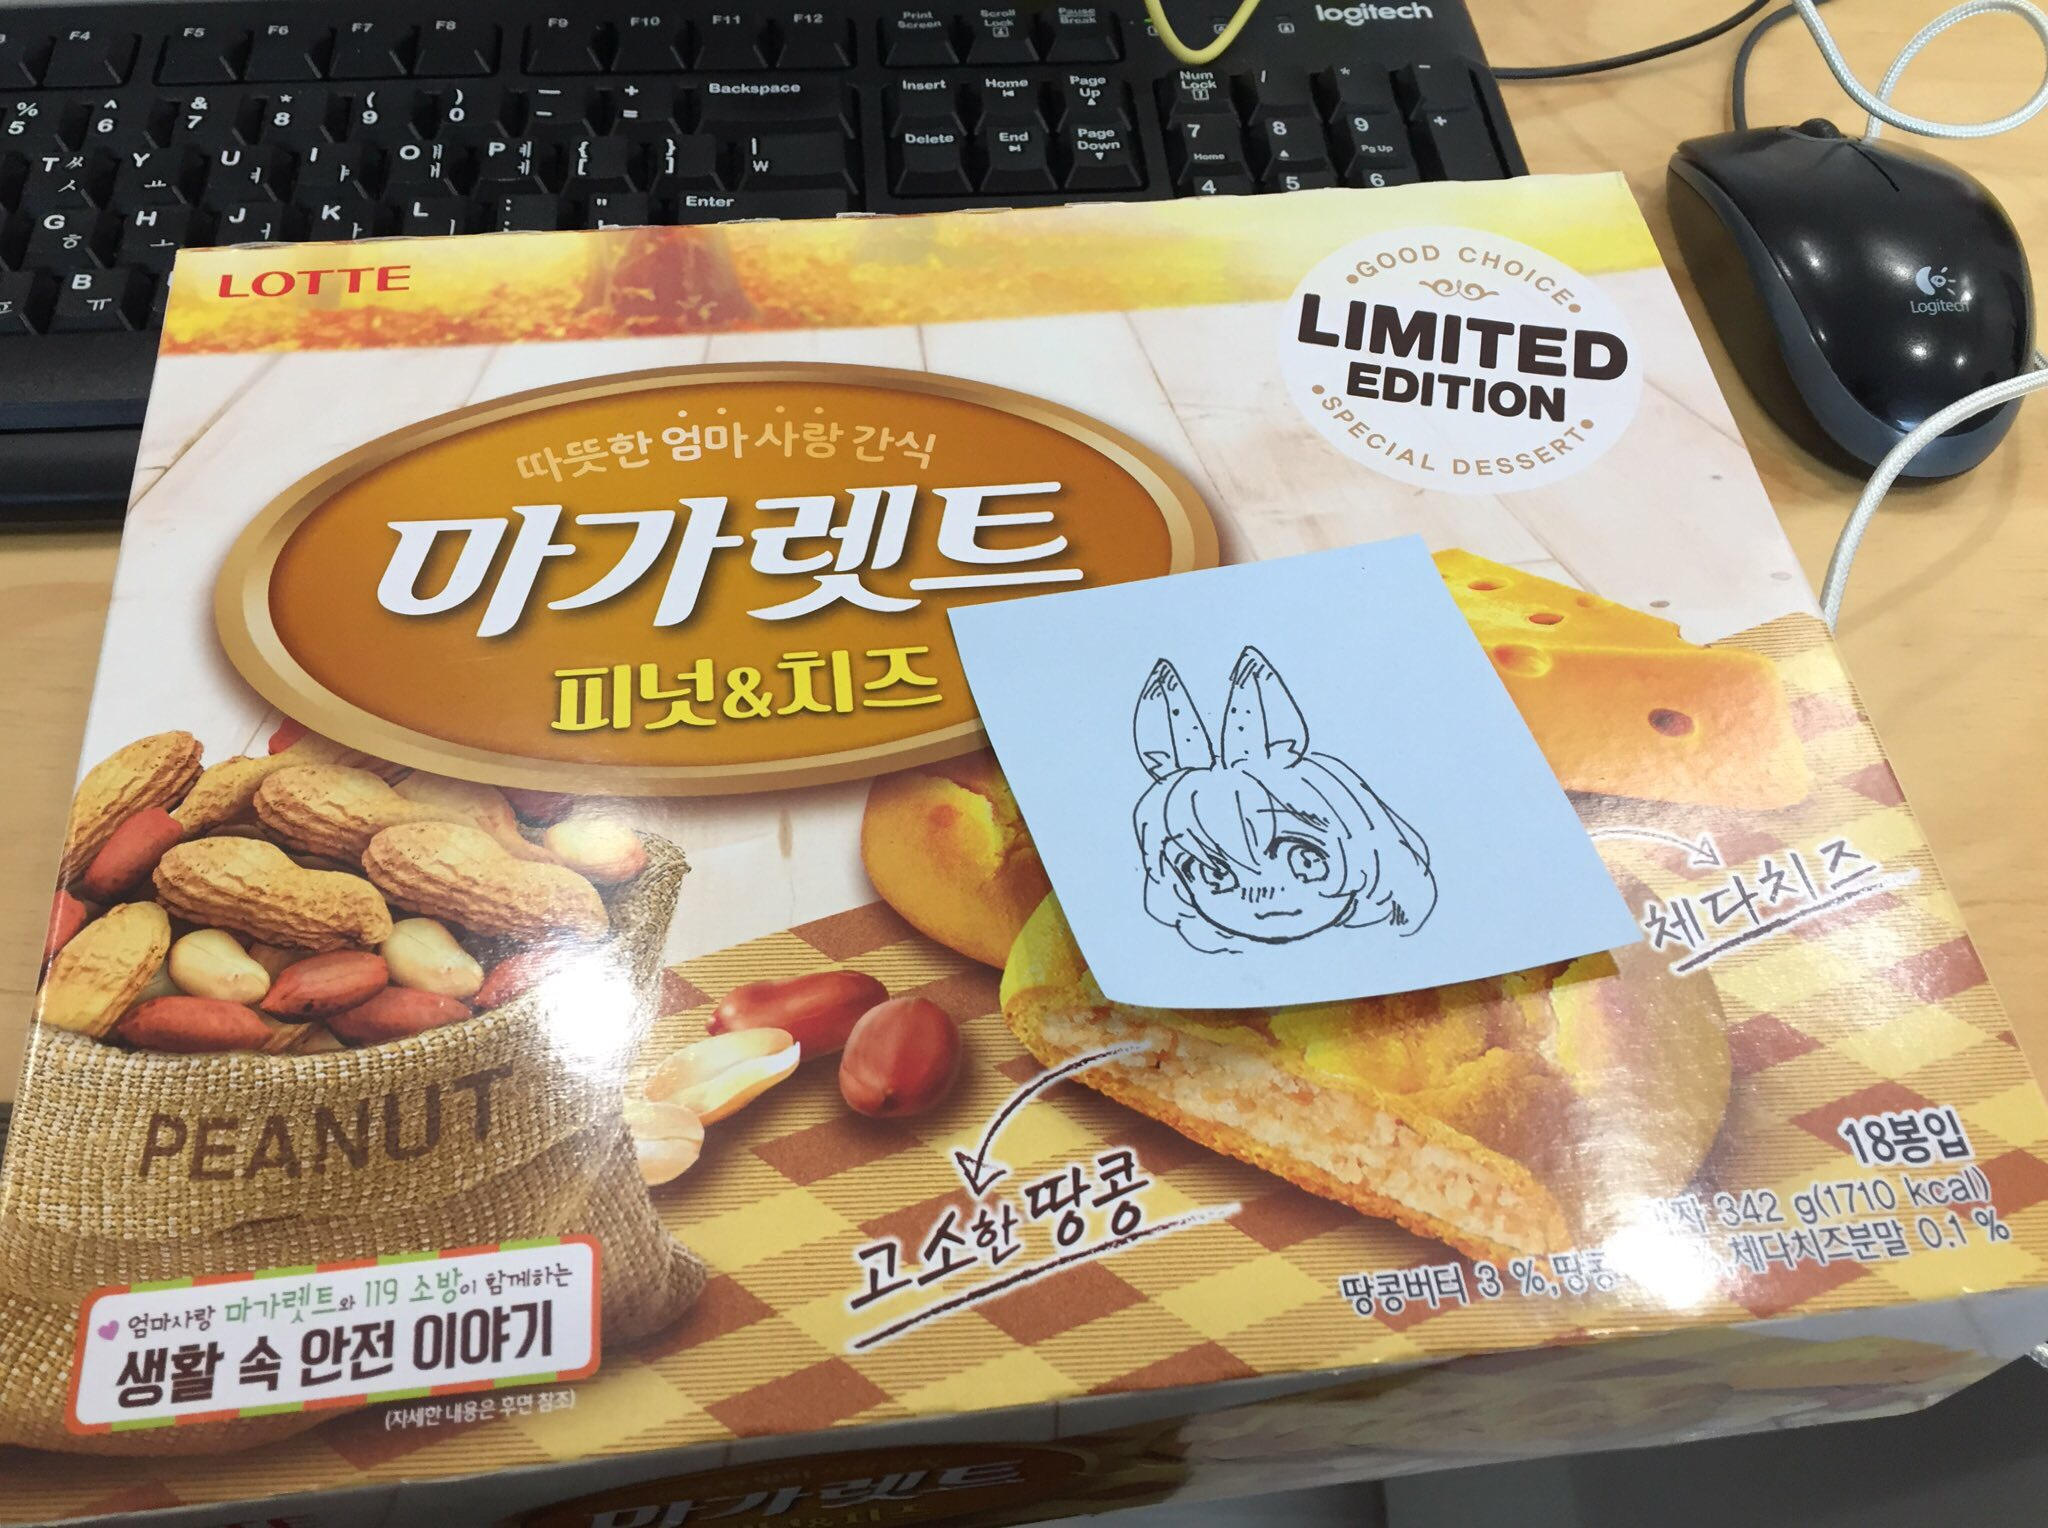 [LOTTE]마가렛트 피넛&치즈